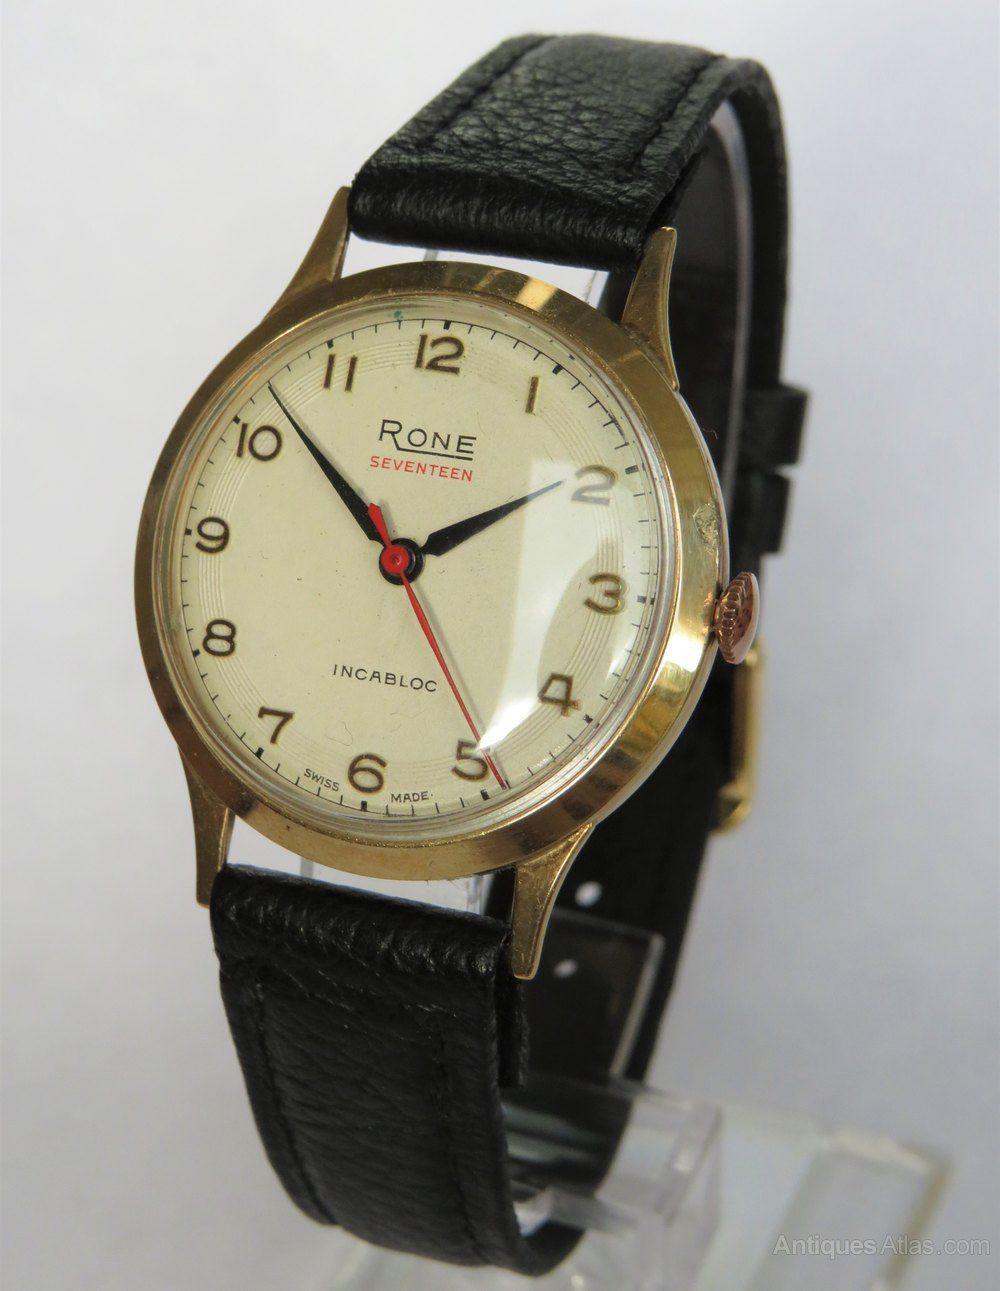 Gold 9 Watch1960 Rone Wrist Atlas Carat Antiques Gents nkZ80OPNwX